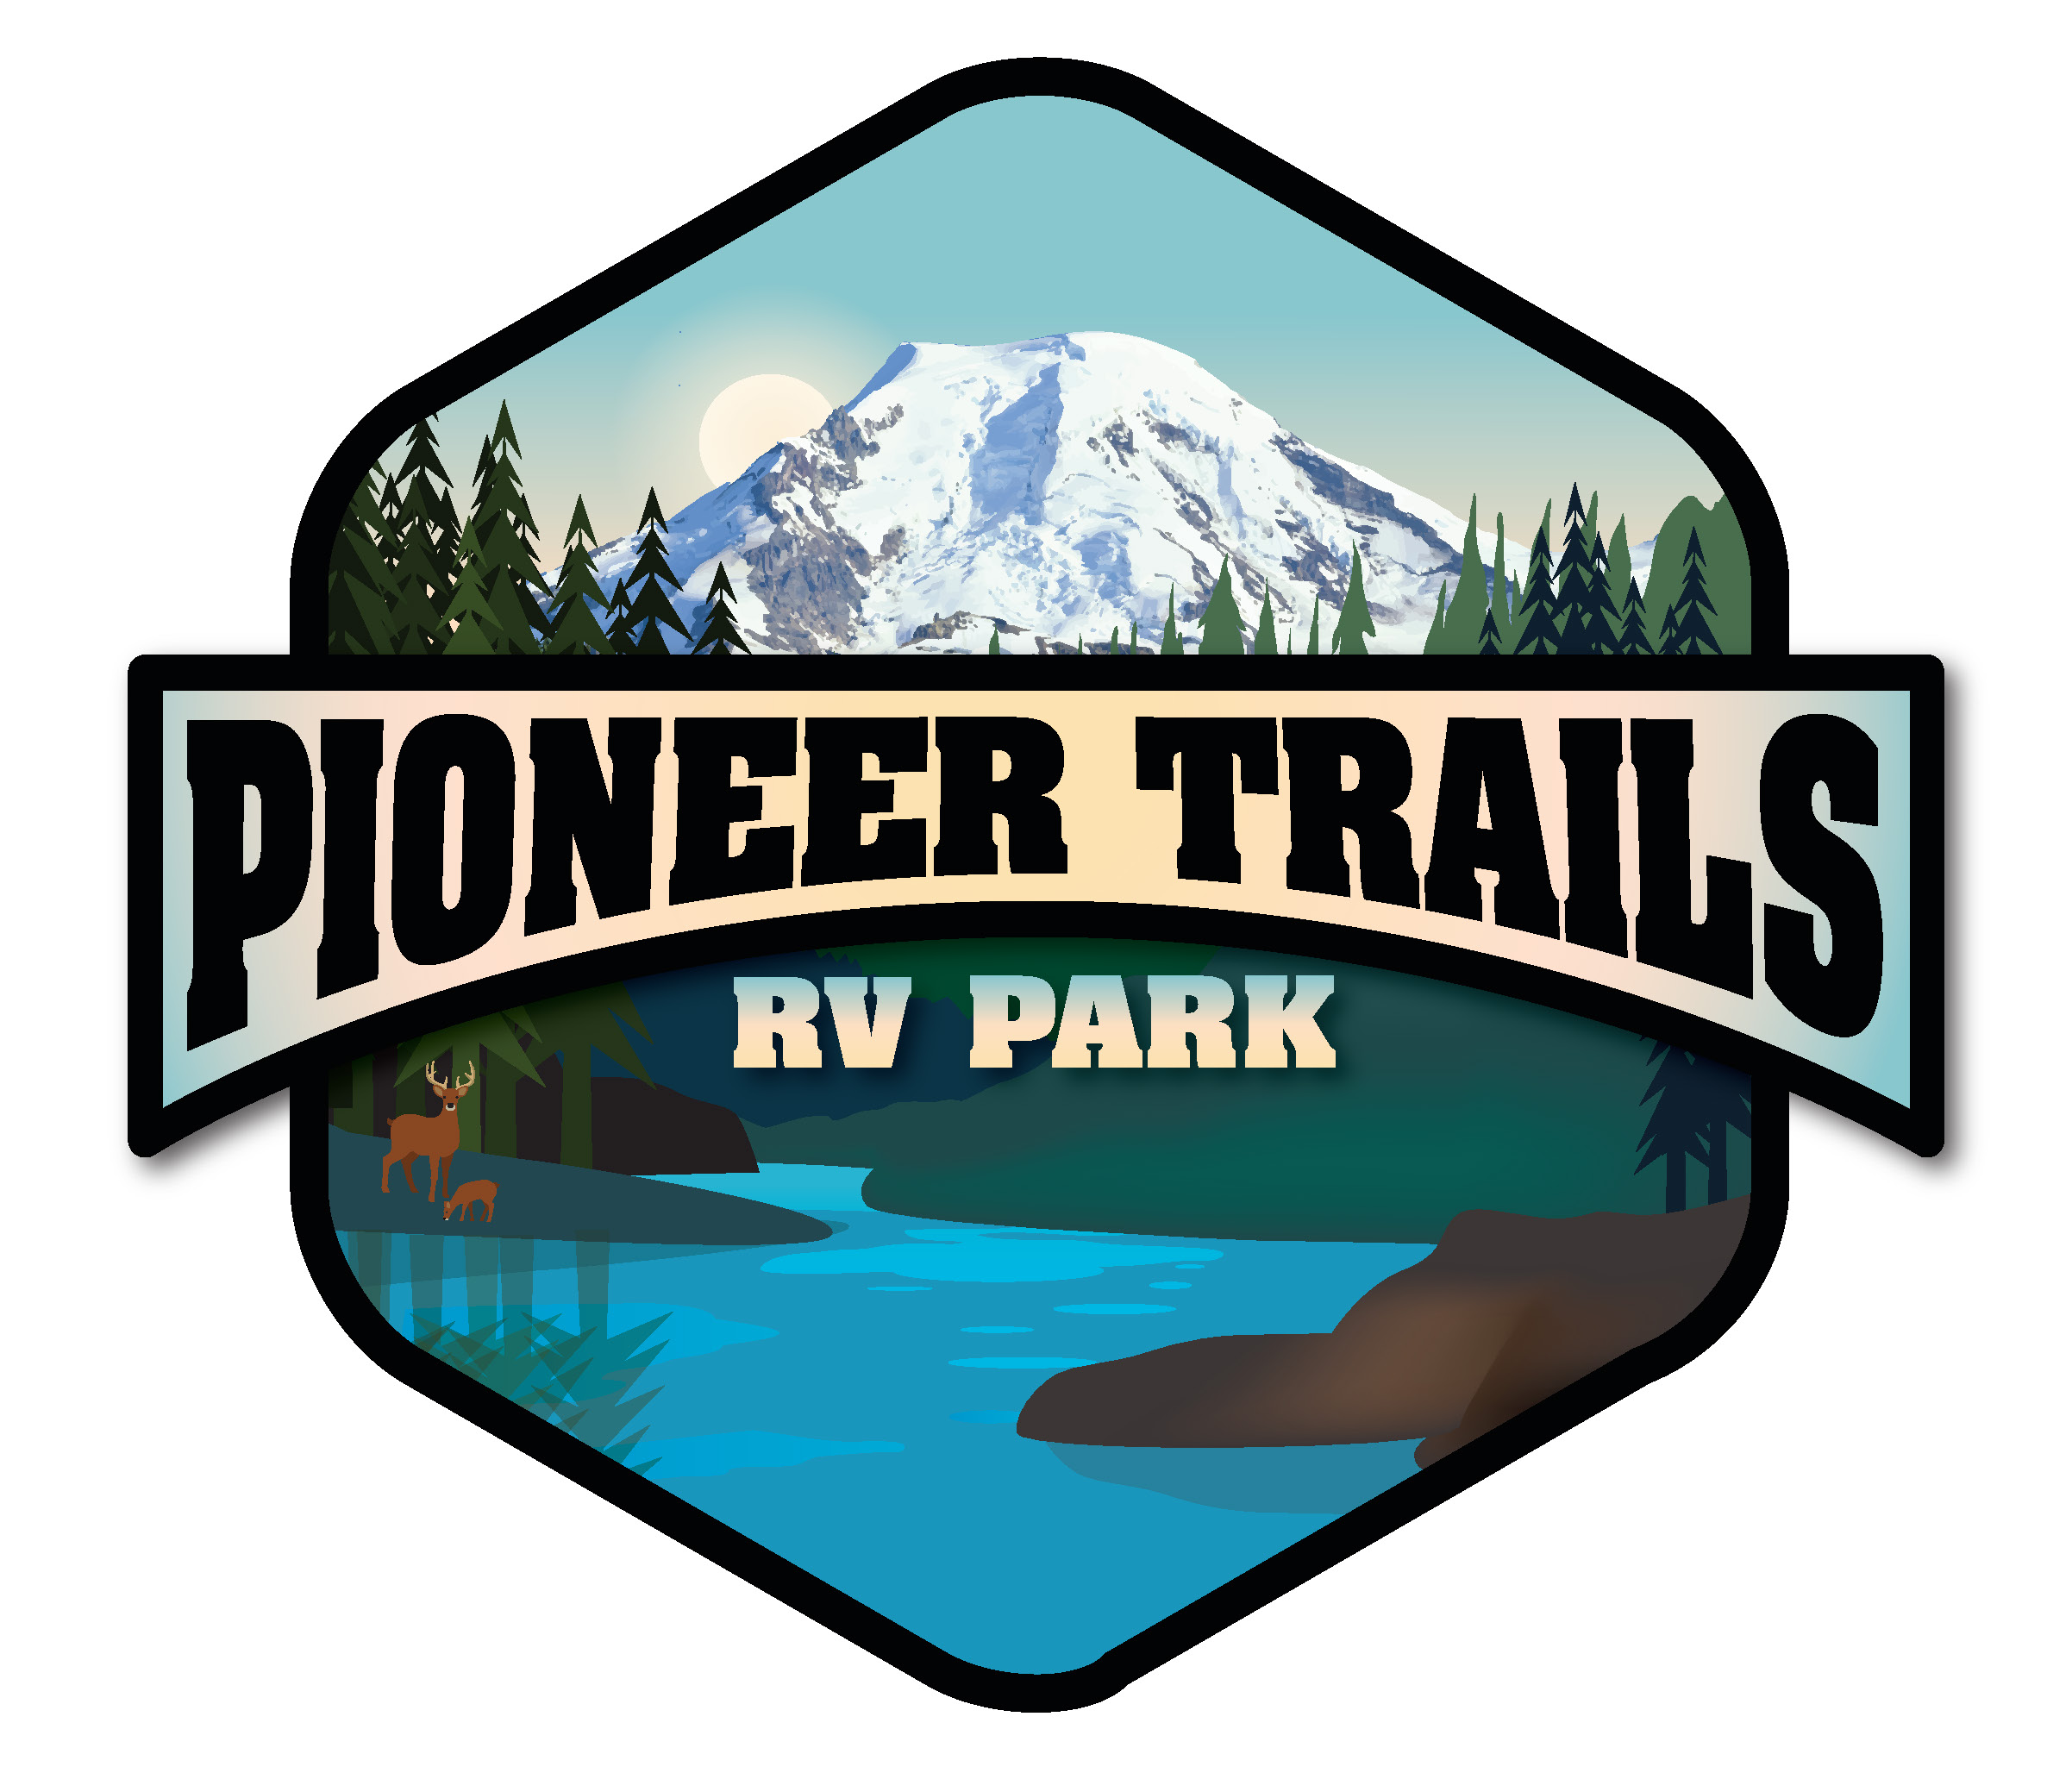 Pioneer Trails RV Park